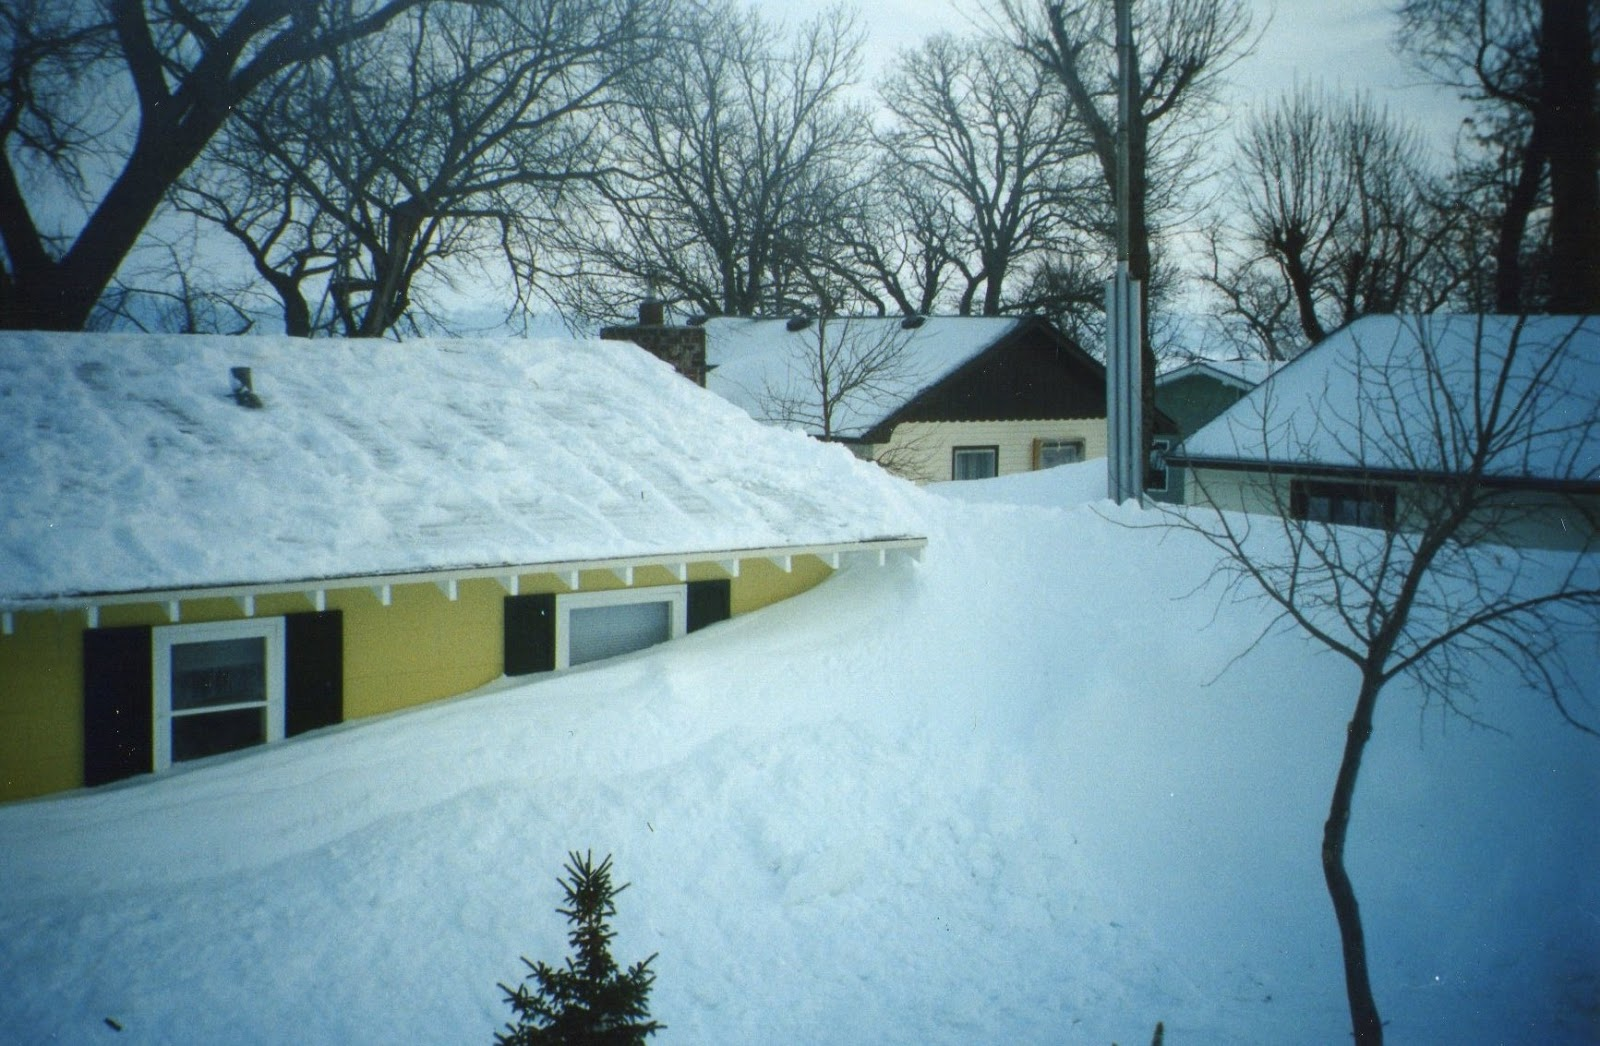 carol j larson author and artist author 39 s notes famous blizzards